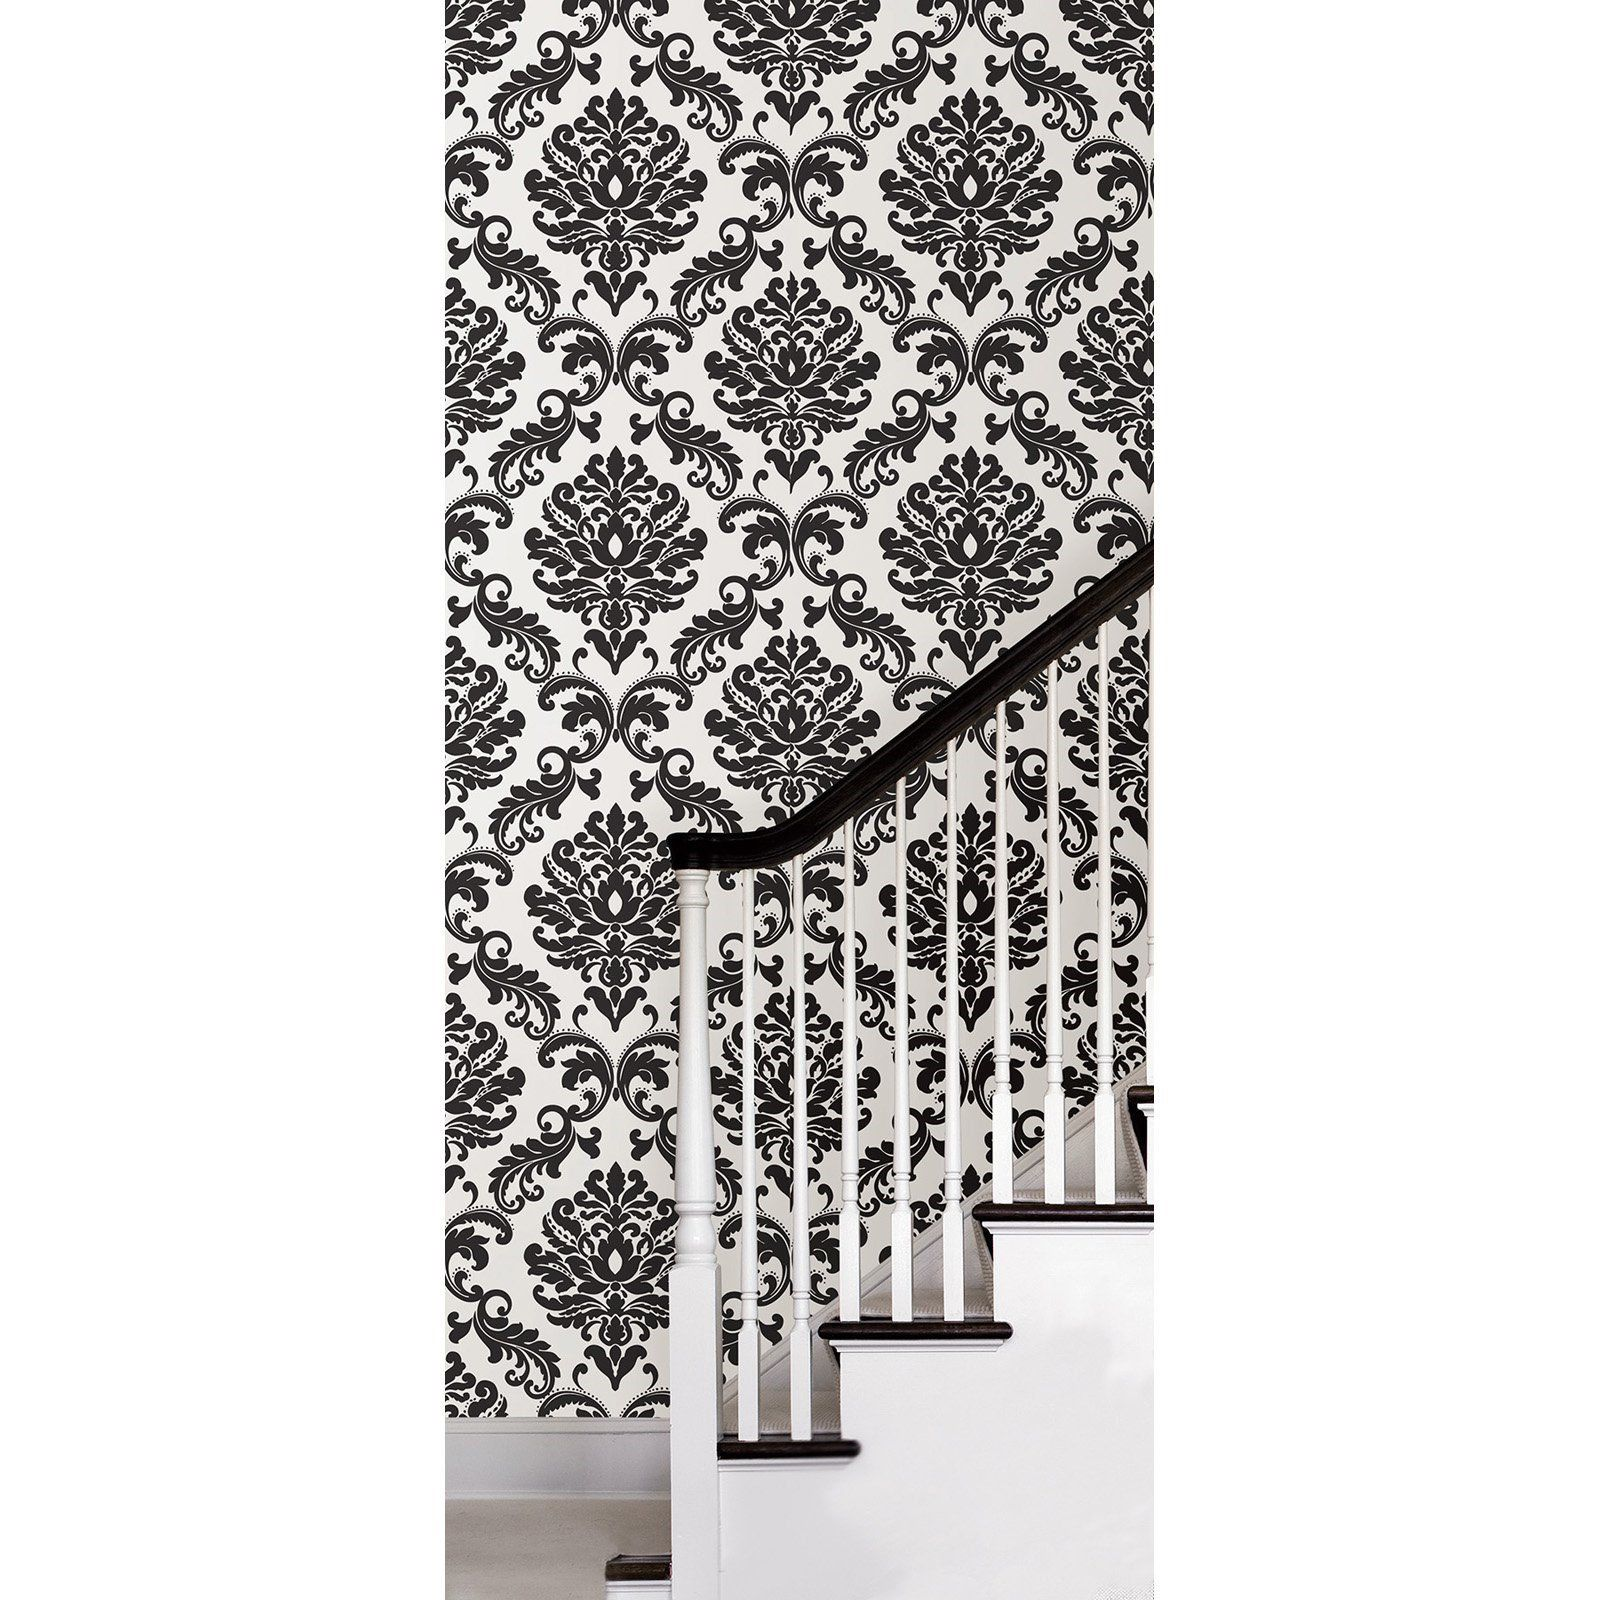 Nuwallpaper Ariel Black And White Damask Peel Stick Wallpaper Walmart Com Peel And Stick Wallpaper Bathroom Wallpaper Black And White White Damask